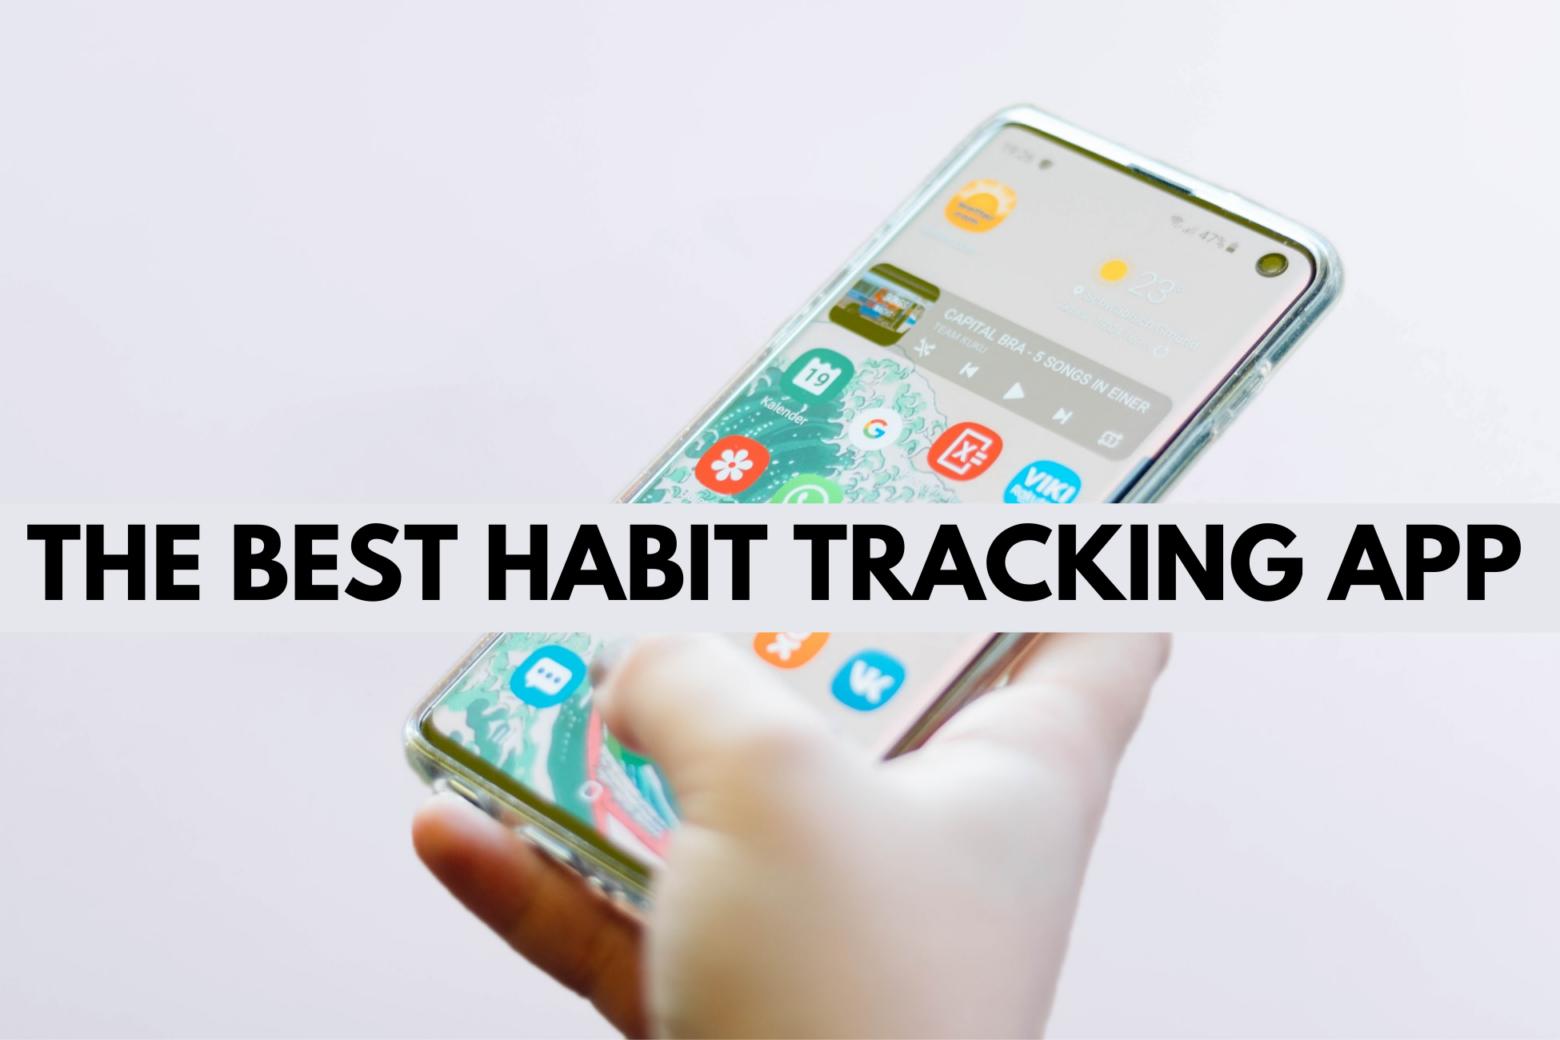 What is the Best Habit TrackingApp